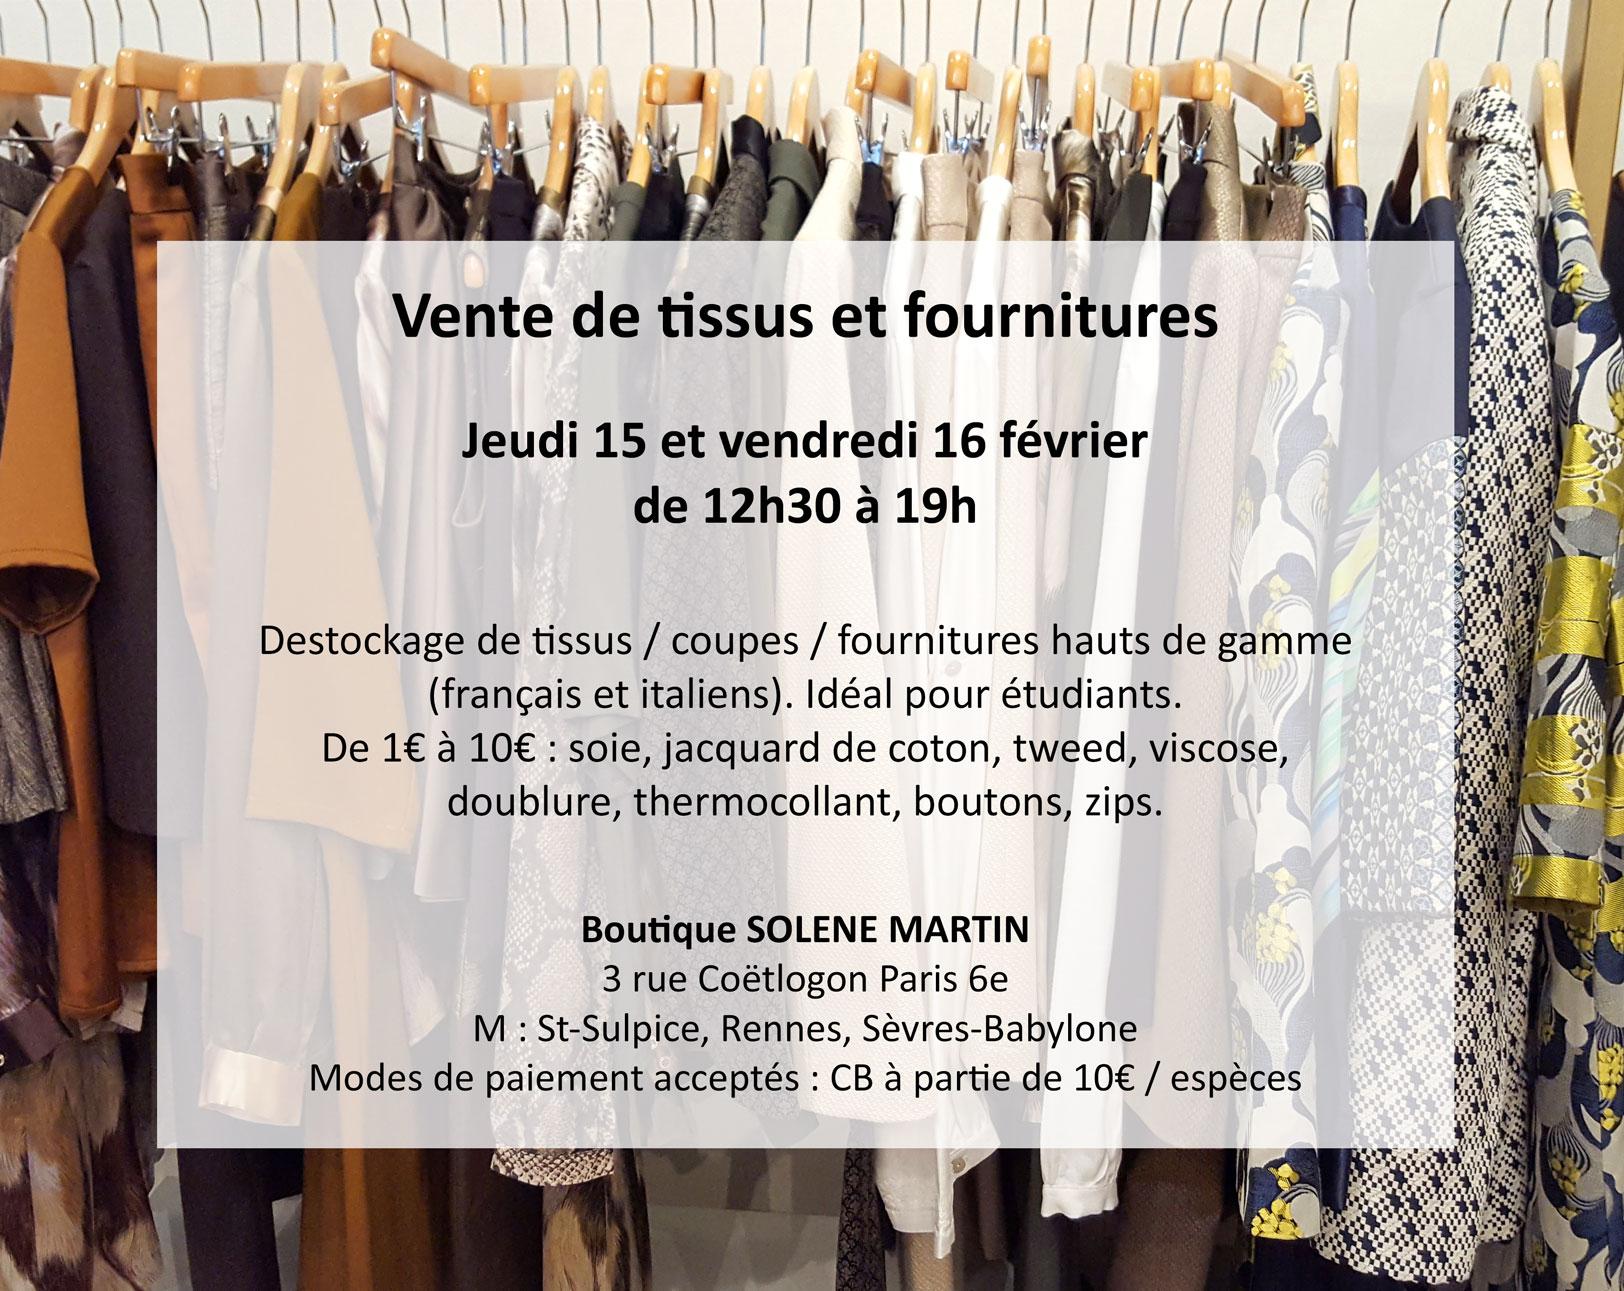 vetement femme mode createur paris vente tissus